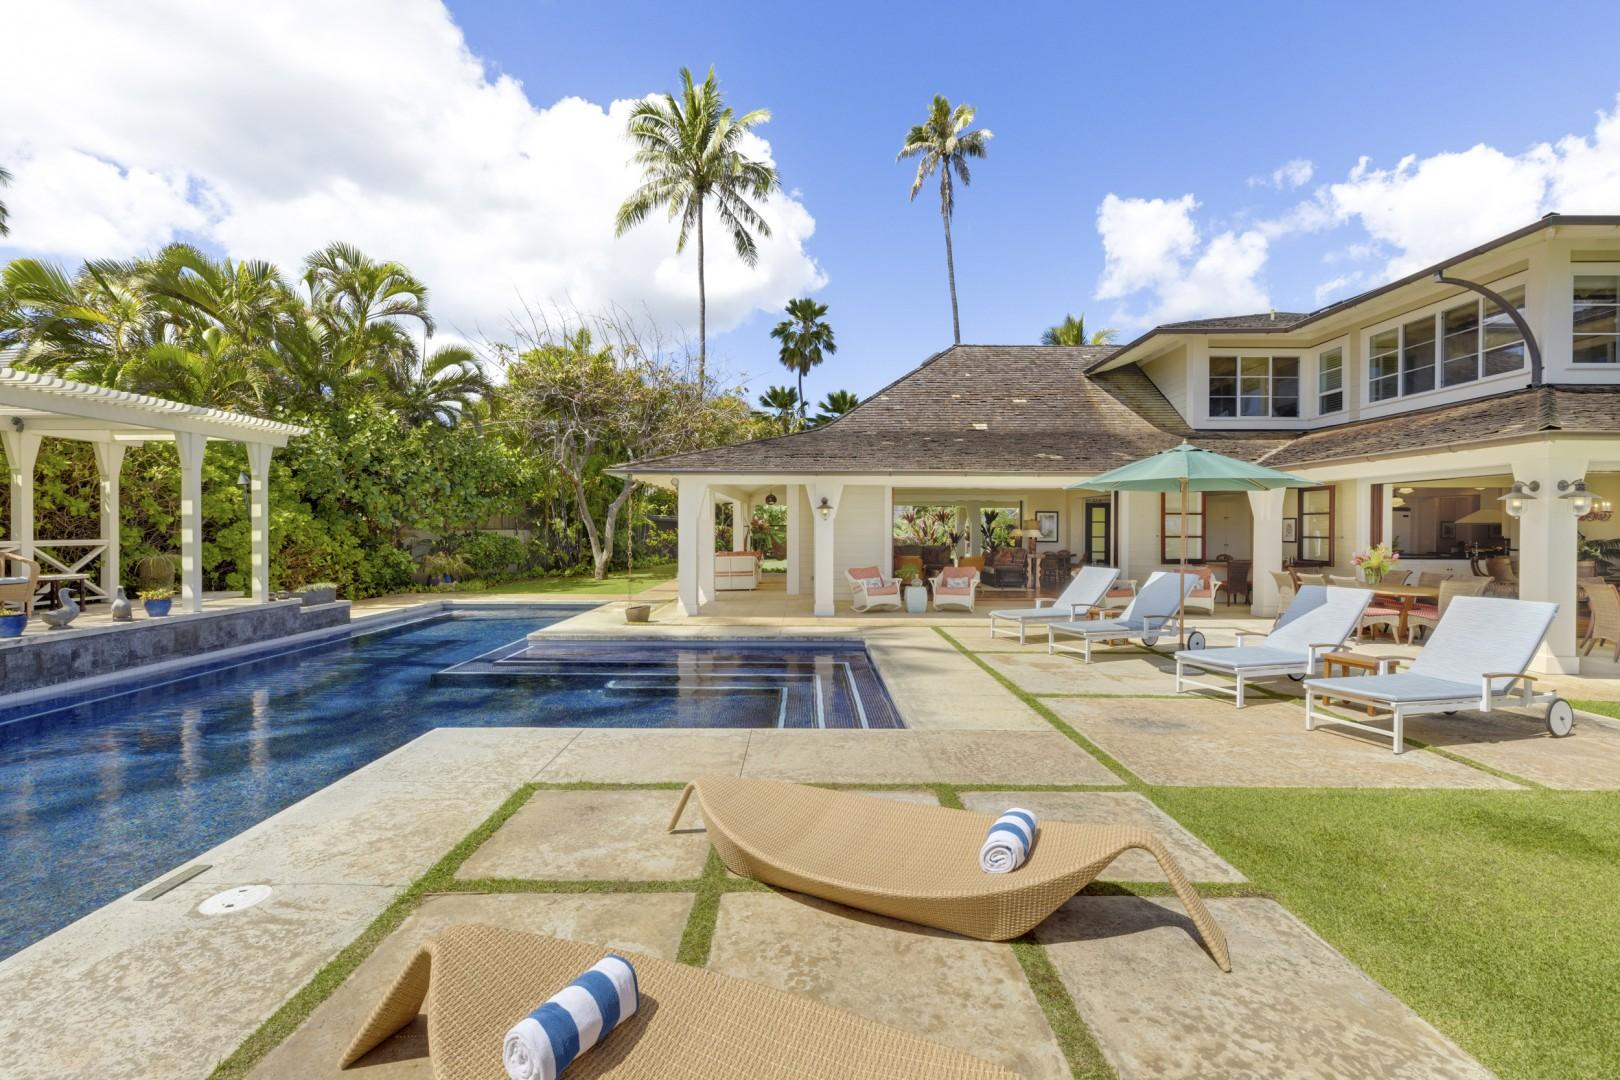 Pool deck, with plenty of lounge options